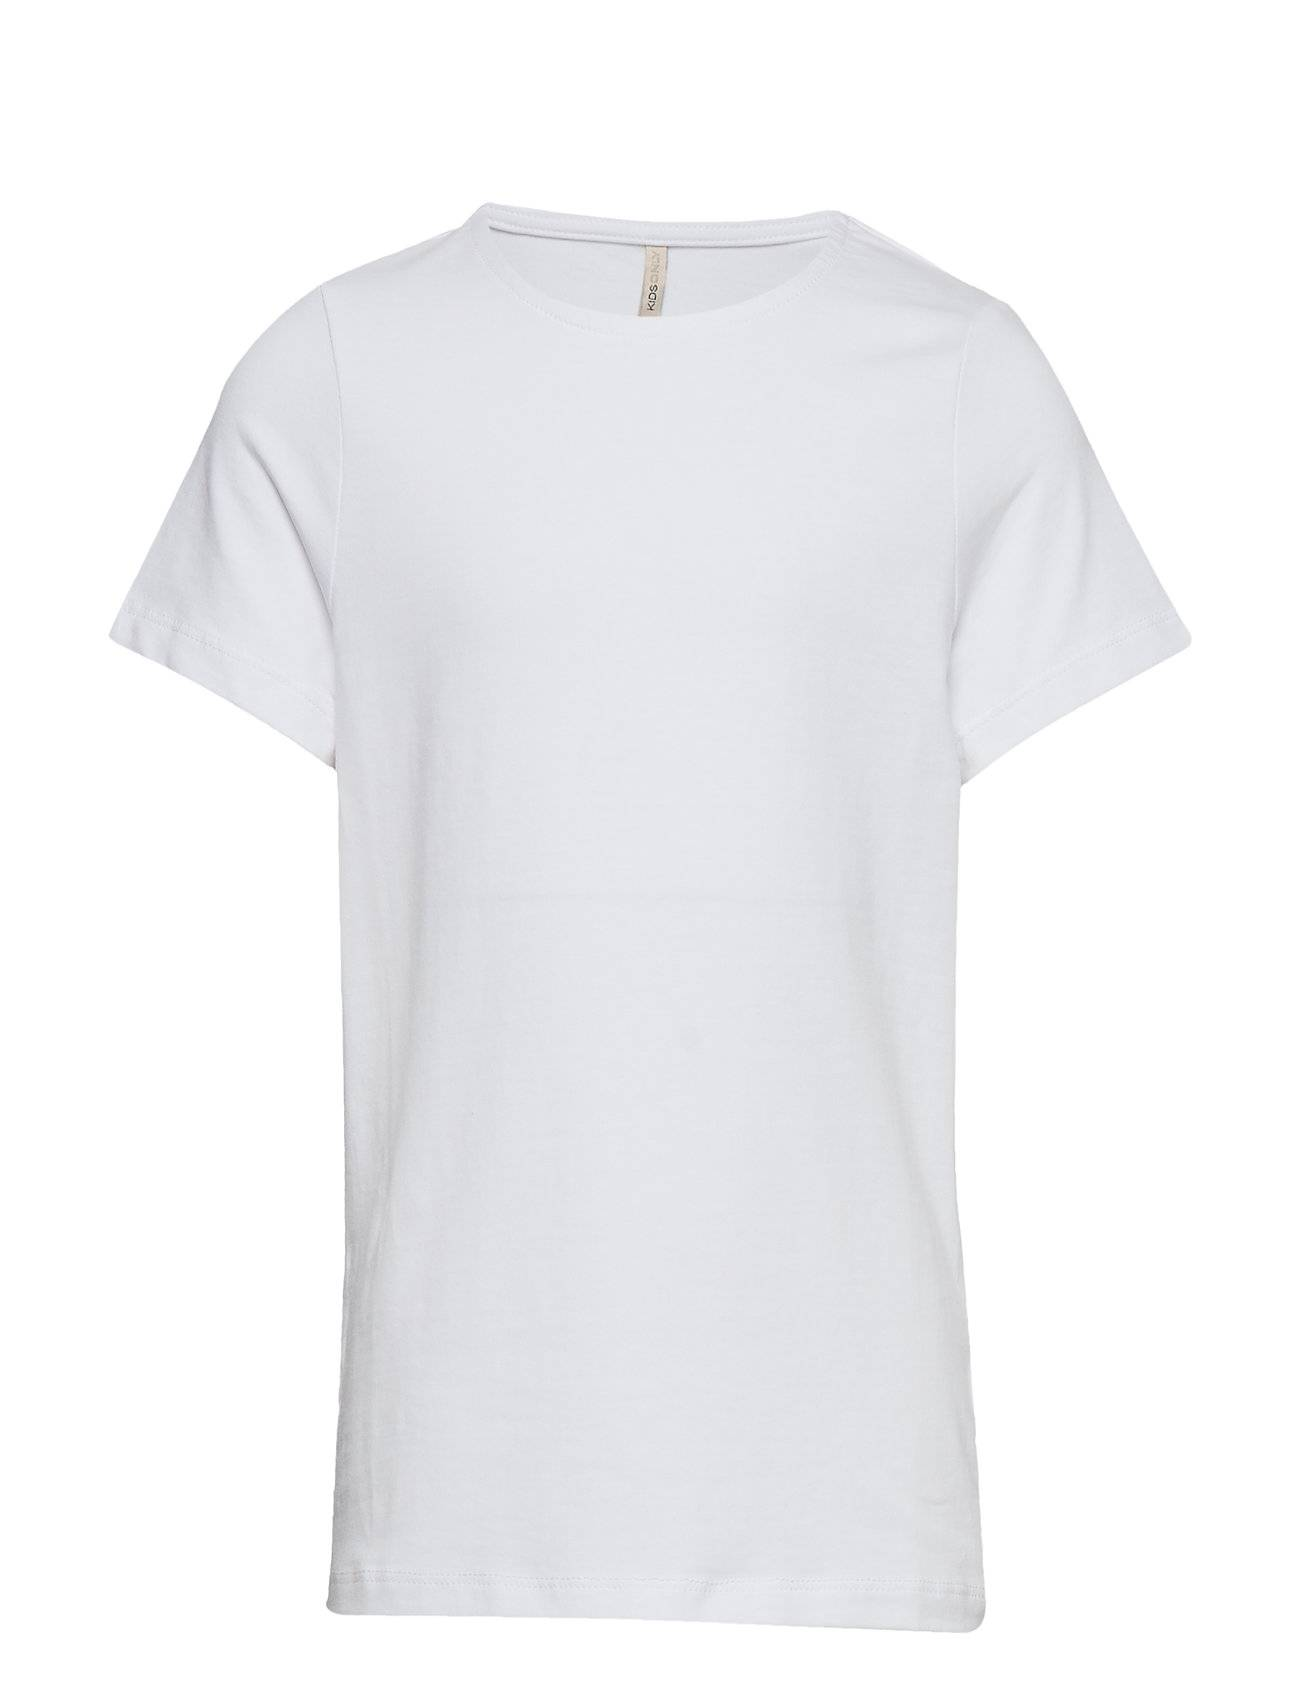 Kids Only Konlove Life S/S Top Noos T-shirts Short-sleeved Valkoinen Kids Only